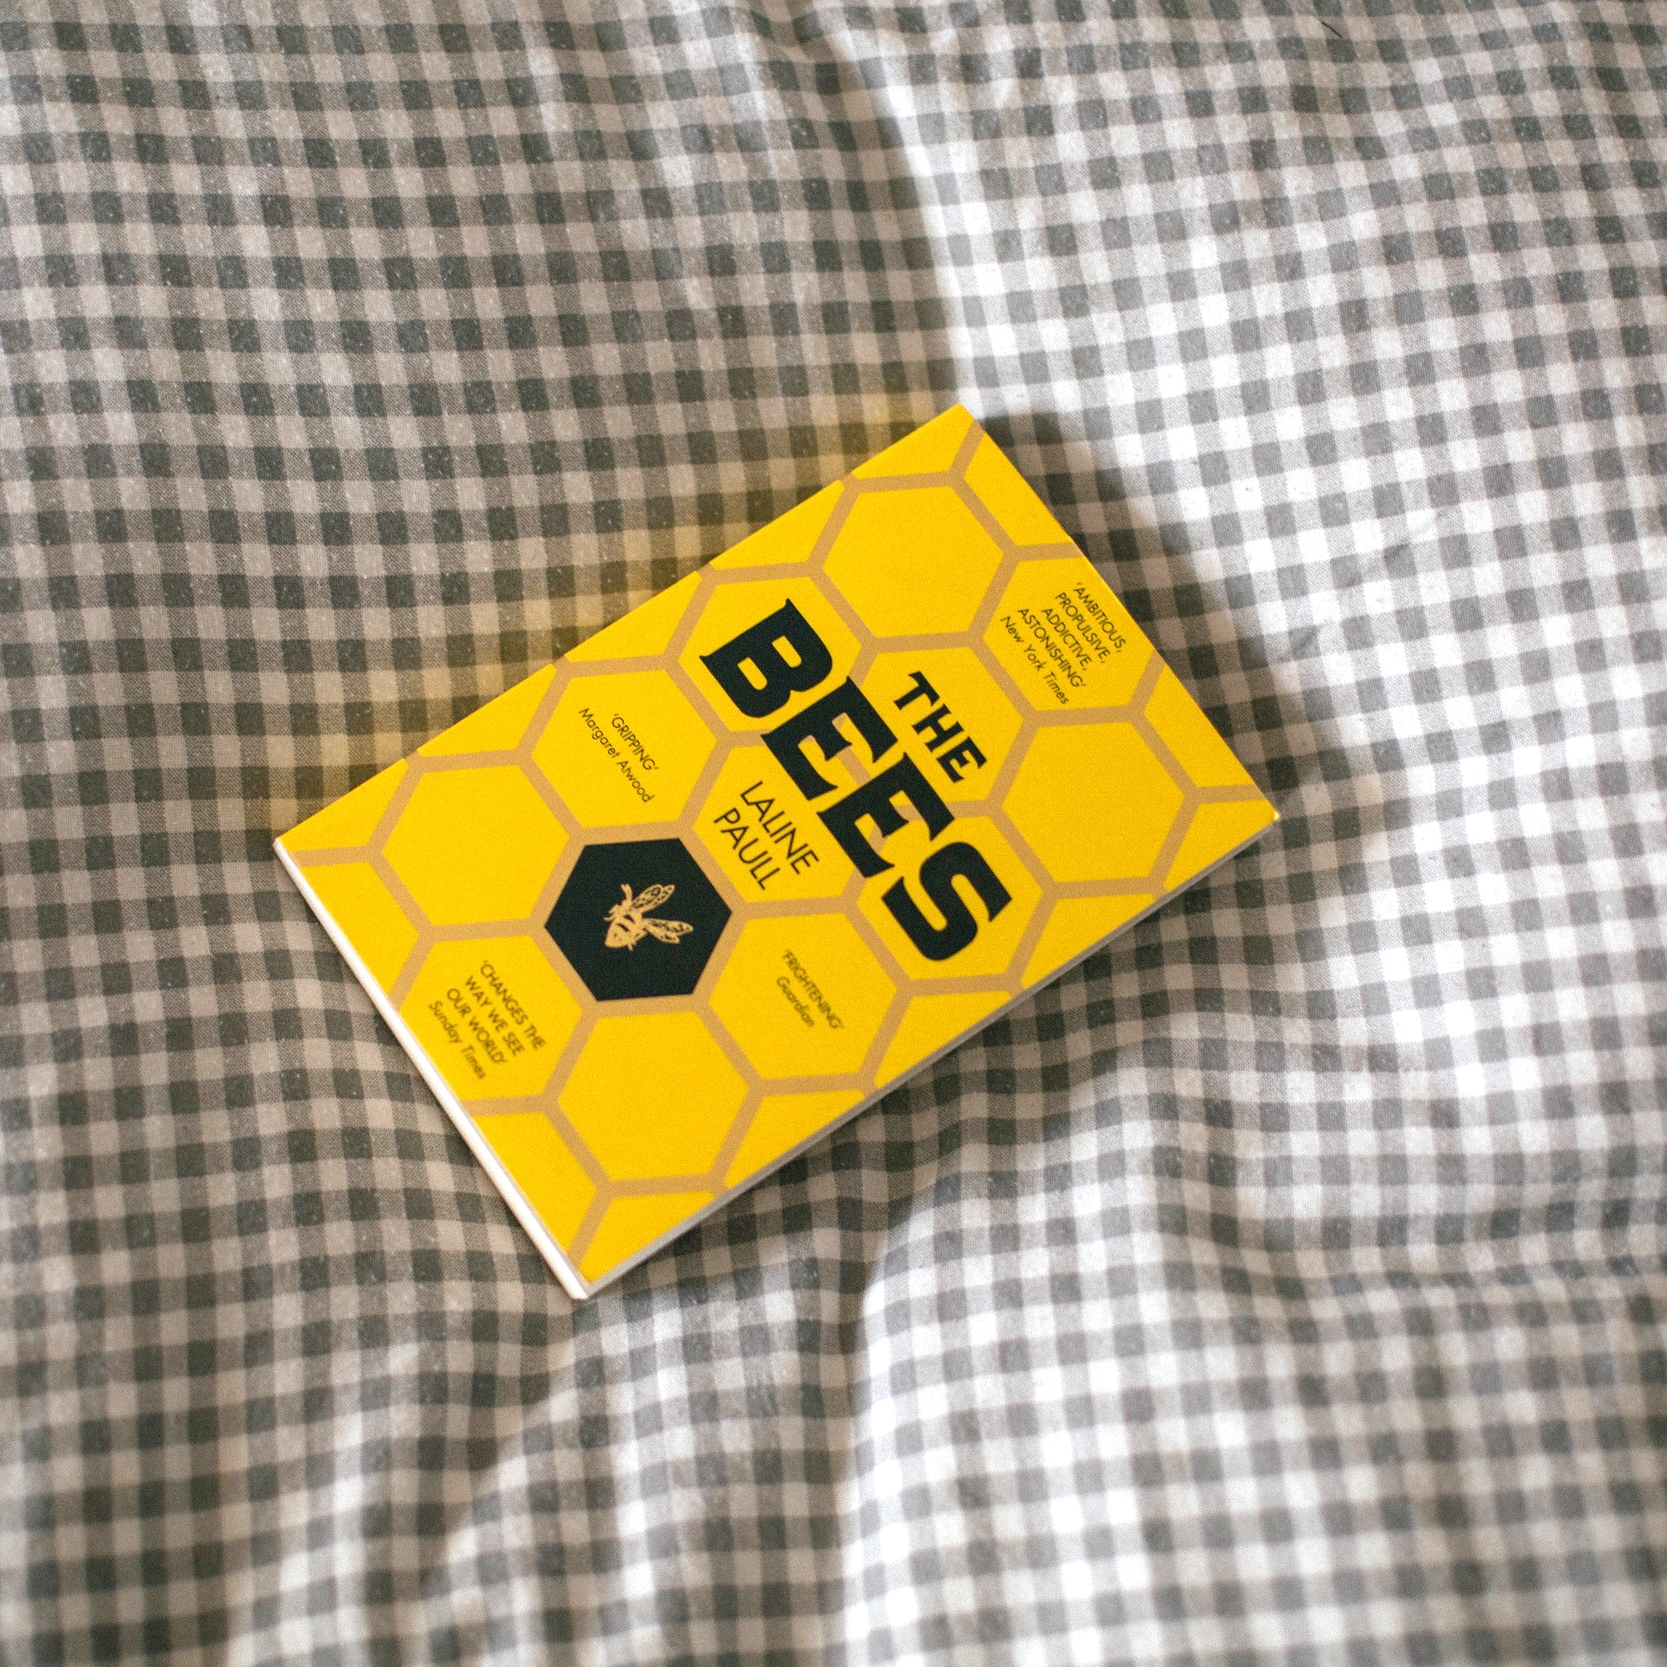 inapavilion-laline-paull-the-bees-8859.jpg